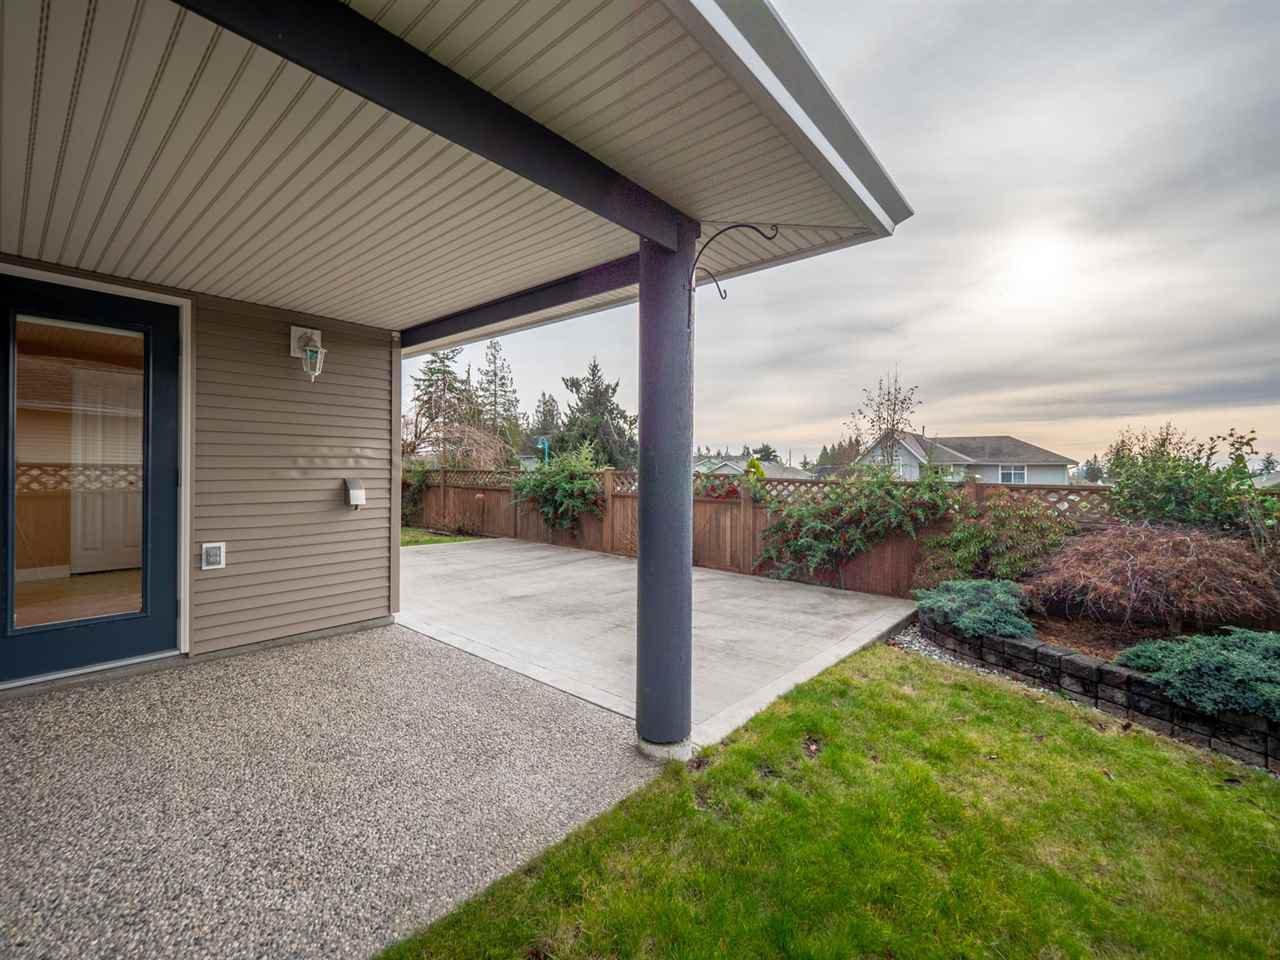 Photo 18: Photos: 5708 EMILY Way in Sechelt: Sechelt District House for sale (Sunshine Coast)  : MLS®# R2328606